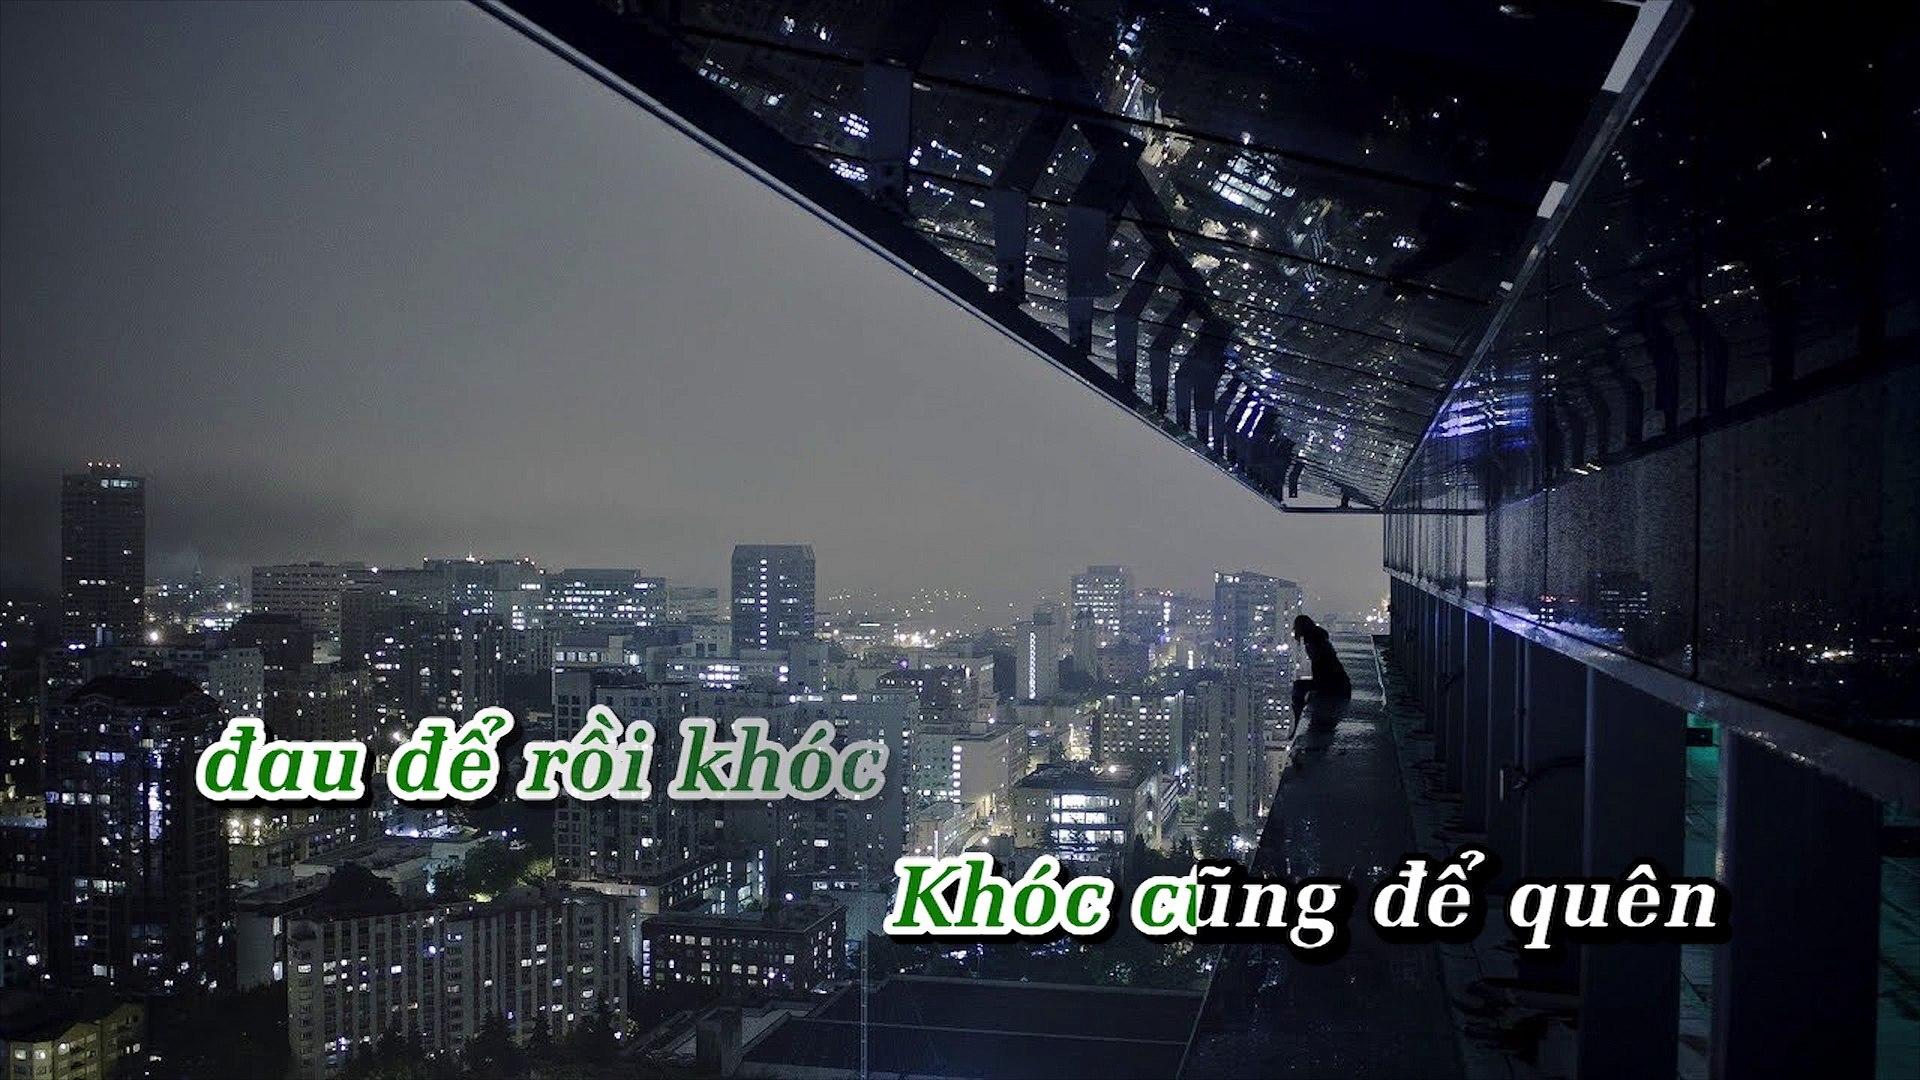 [Karaoke] Trời Tối - Lk Ft. Andiez [Beat]